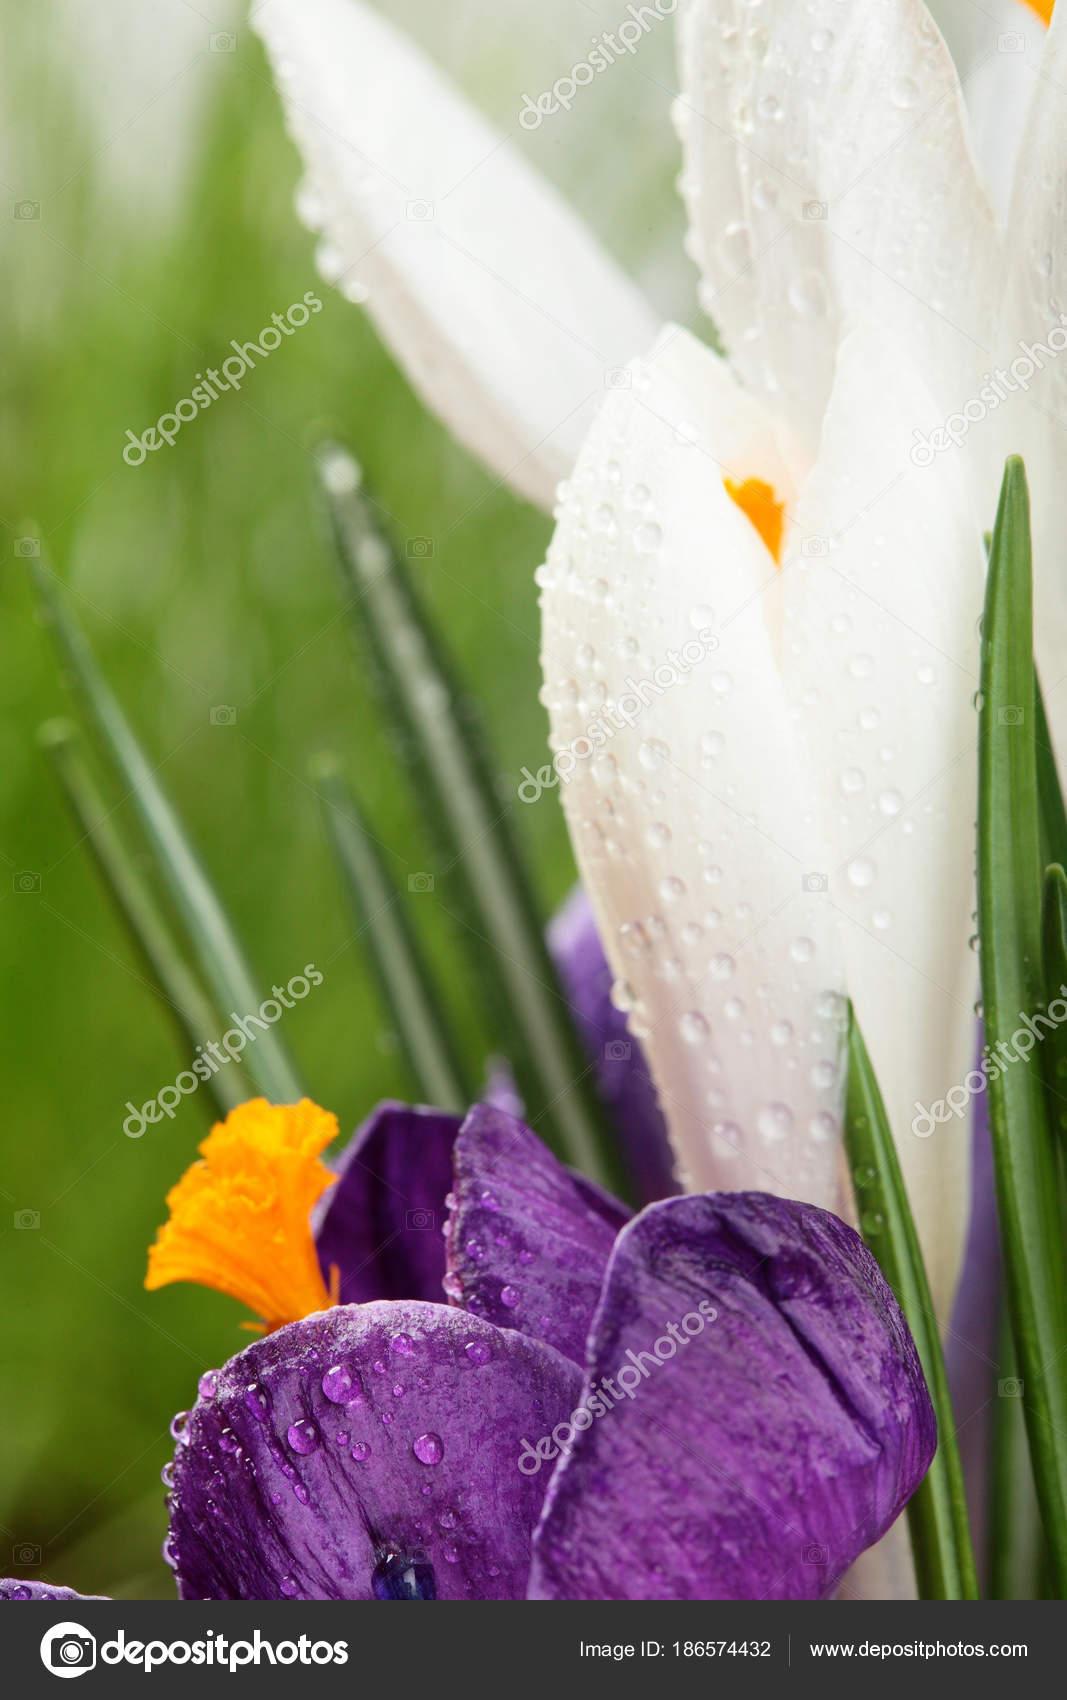 Crocusautiful first spring flowers crocuses bloom macrooseup beautiful first spring flowers crocuses bloom macrooseup lective focusckgroundpy space photo by simplessellerail mightylinksfo